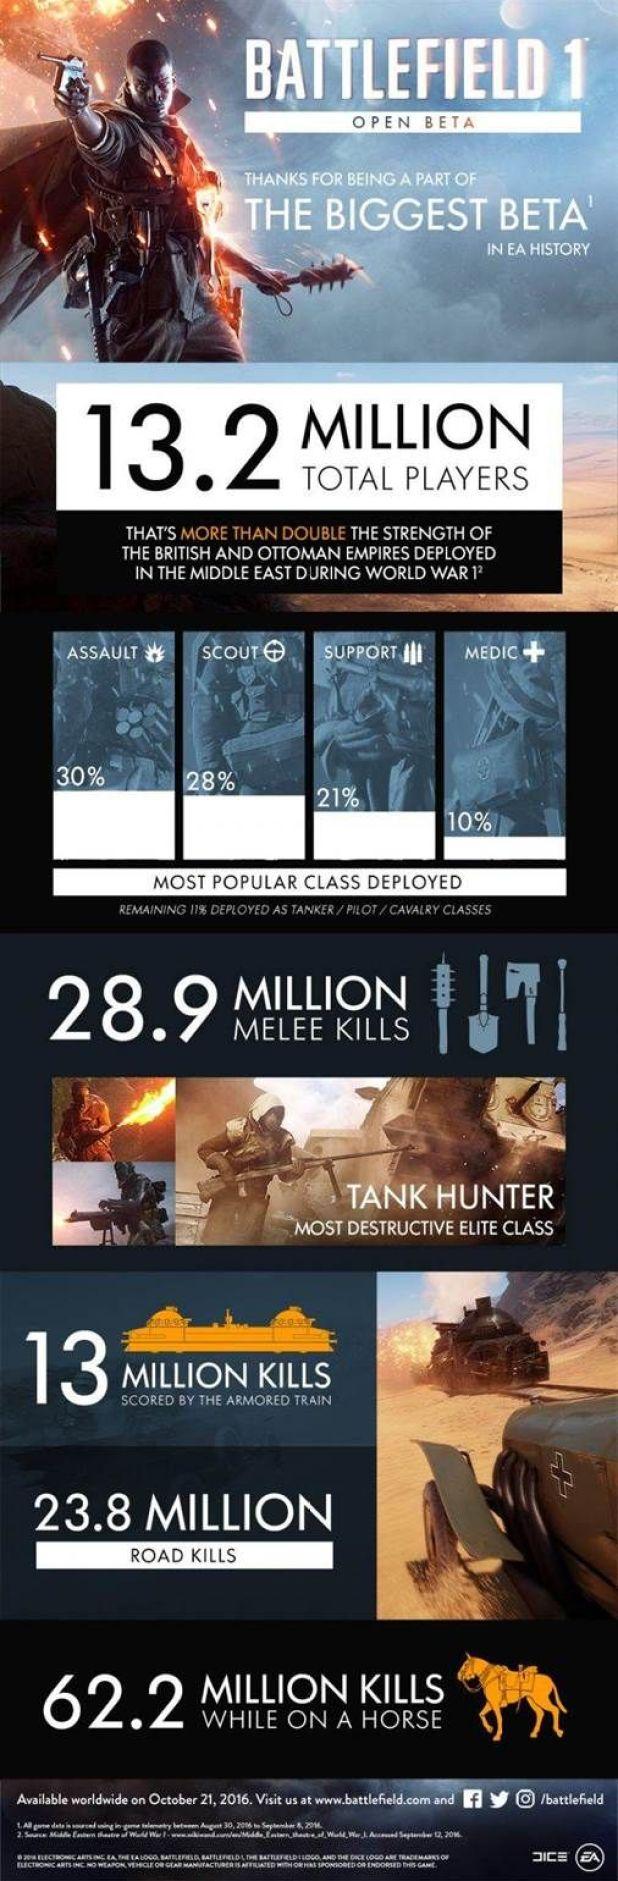 battlefield-1-768x2337